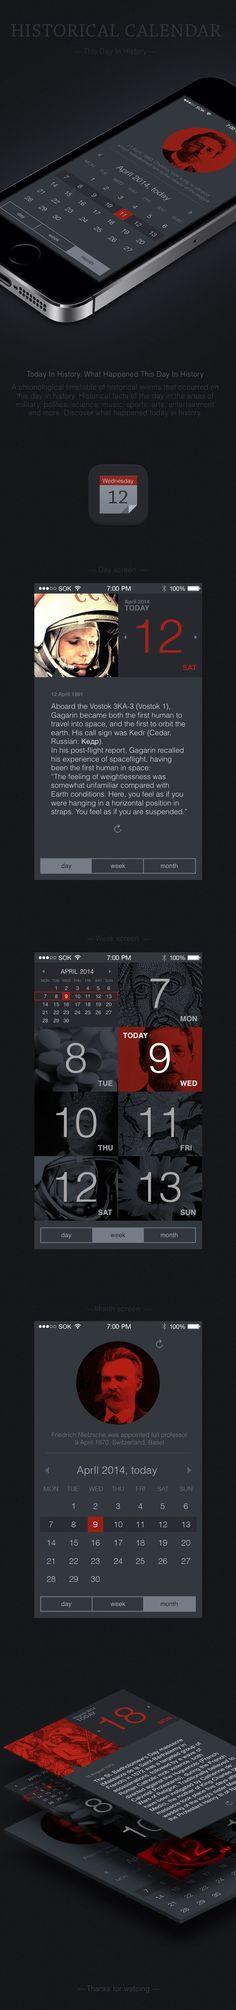 HistoricaL Calendar by Pavel Klochko, via Behance